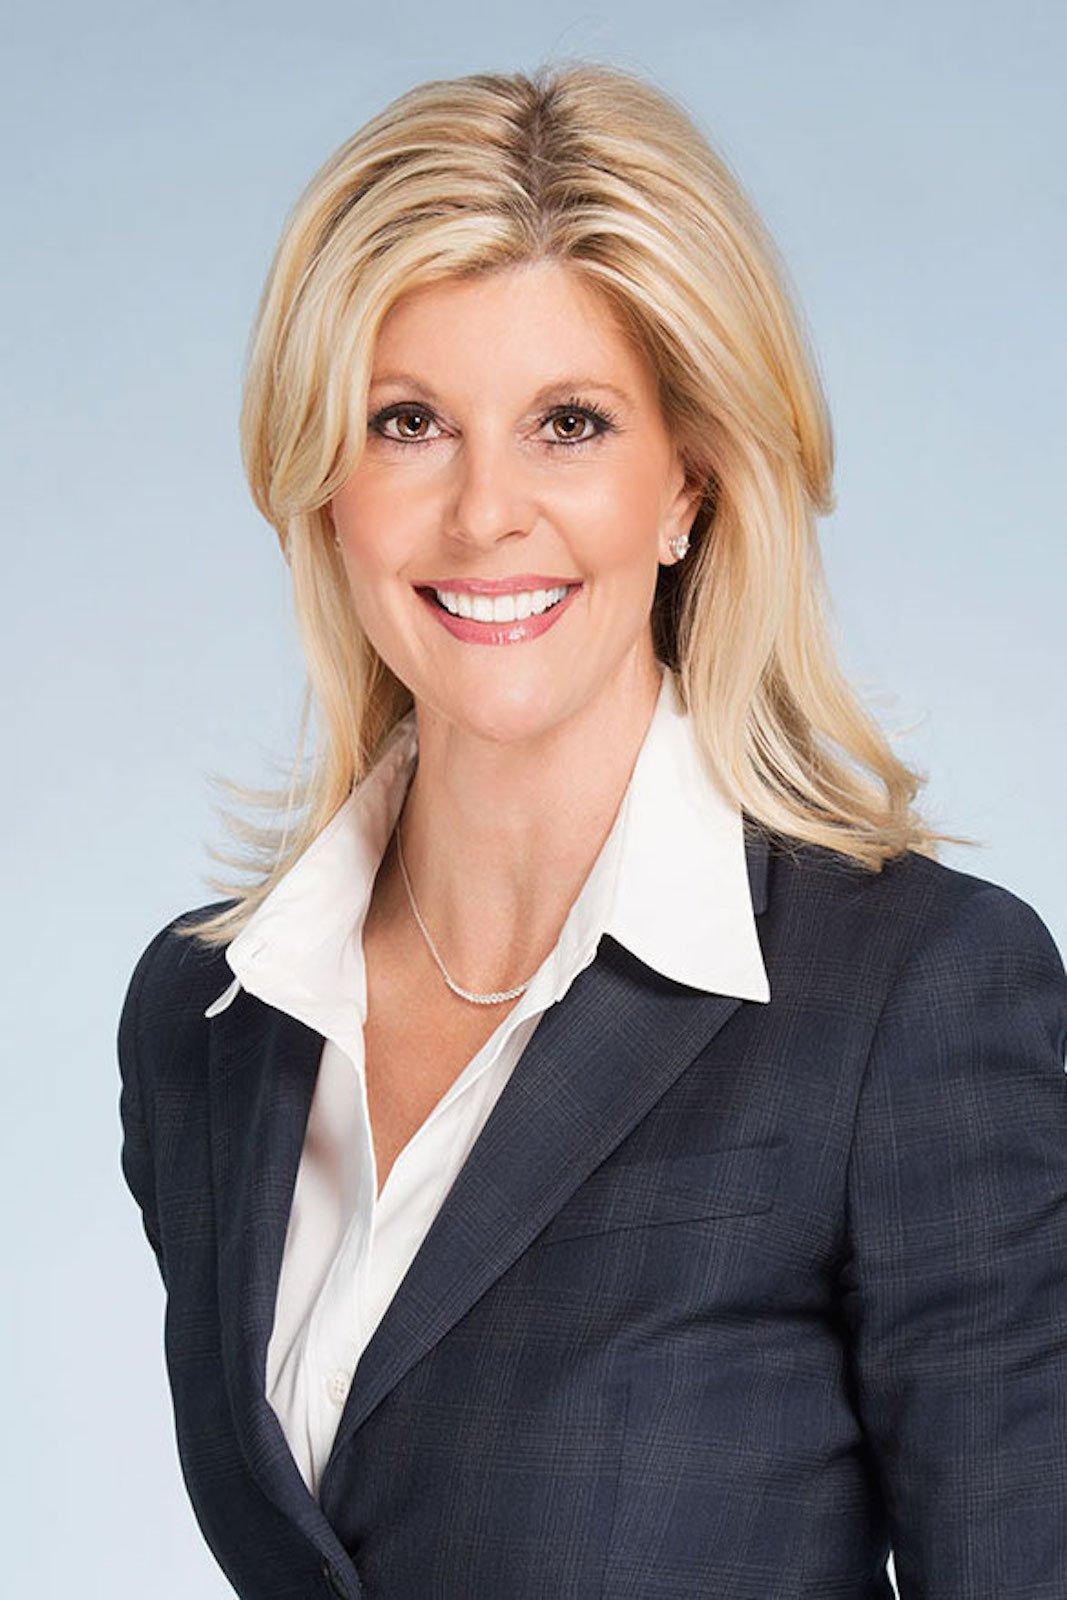 Cheryl Dixson